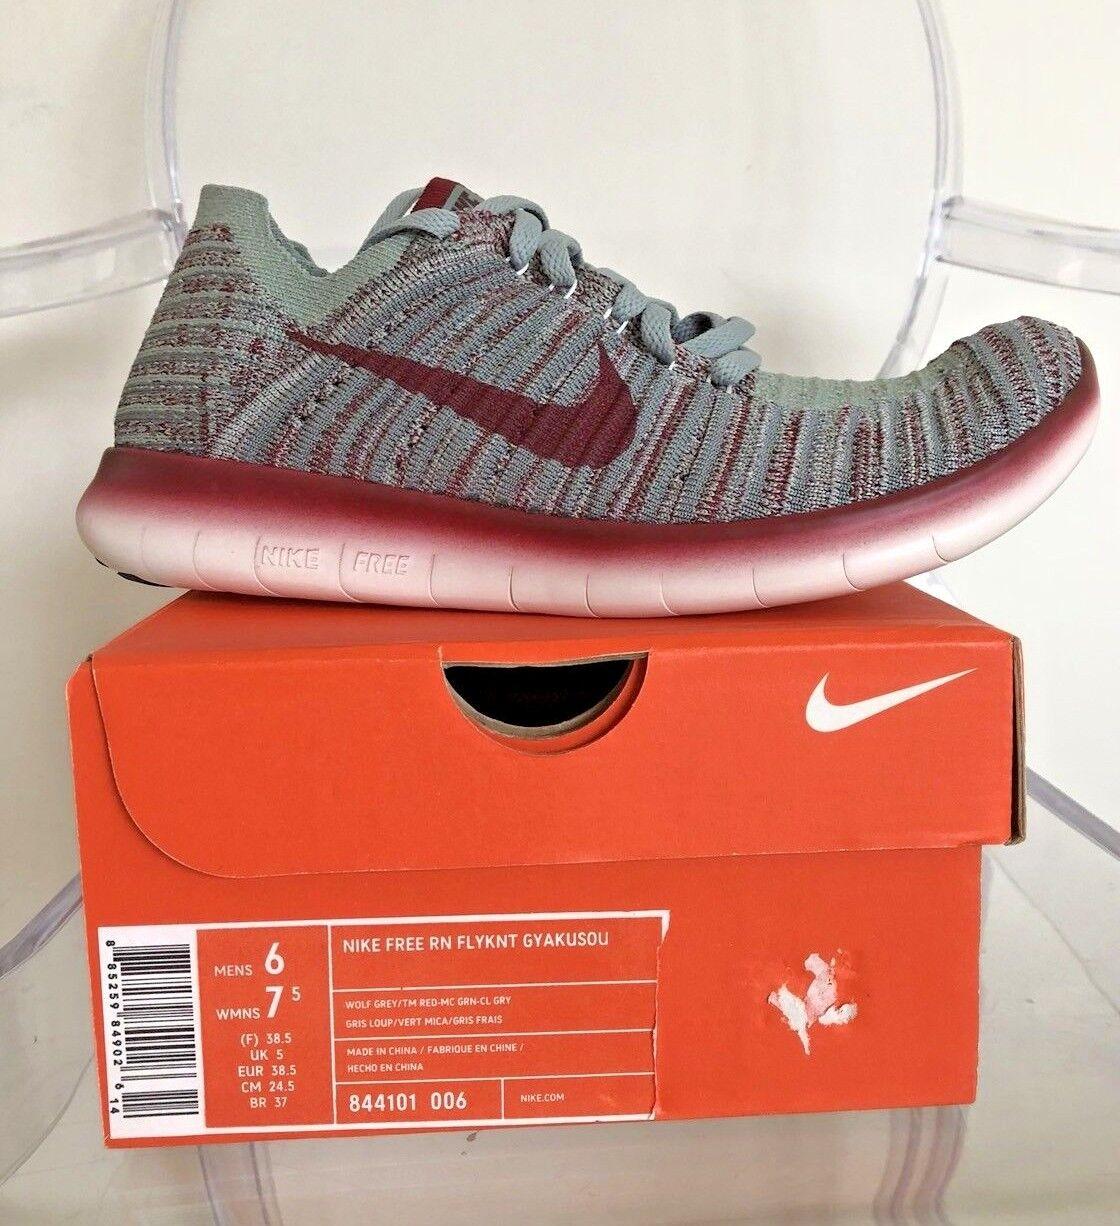 Nike libera rn flyknit gyakusou 844101 006 lupo grigio / tm rosso m 6 / w